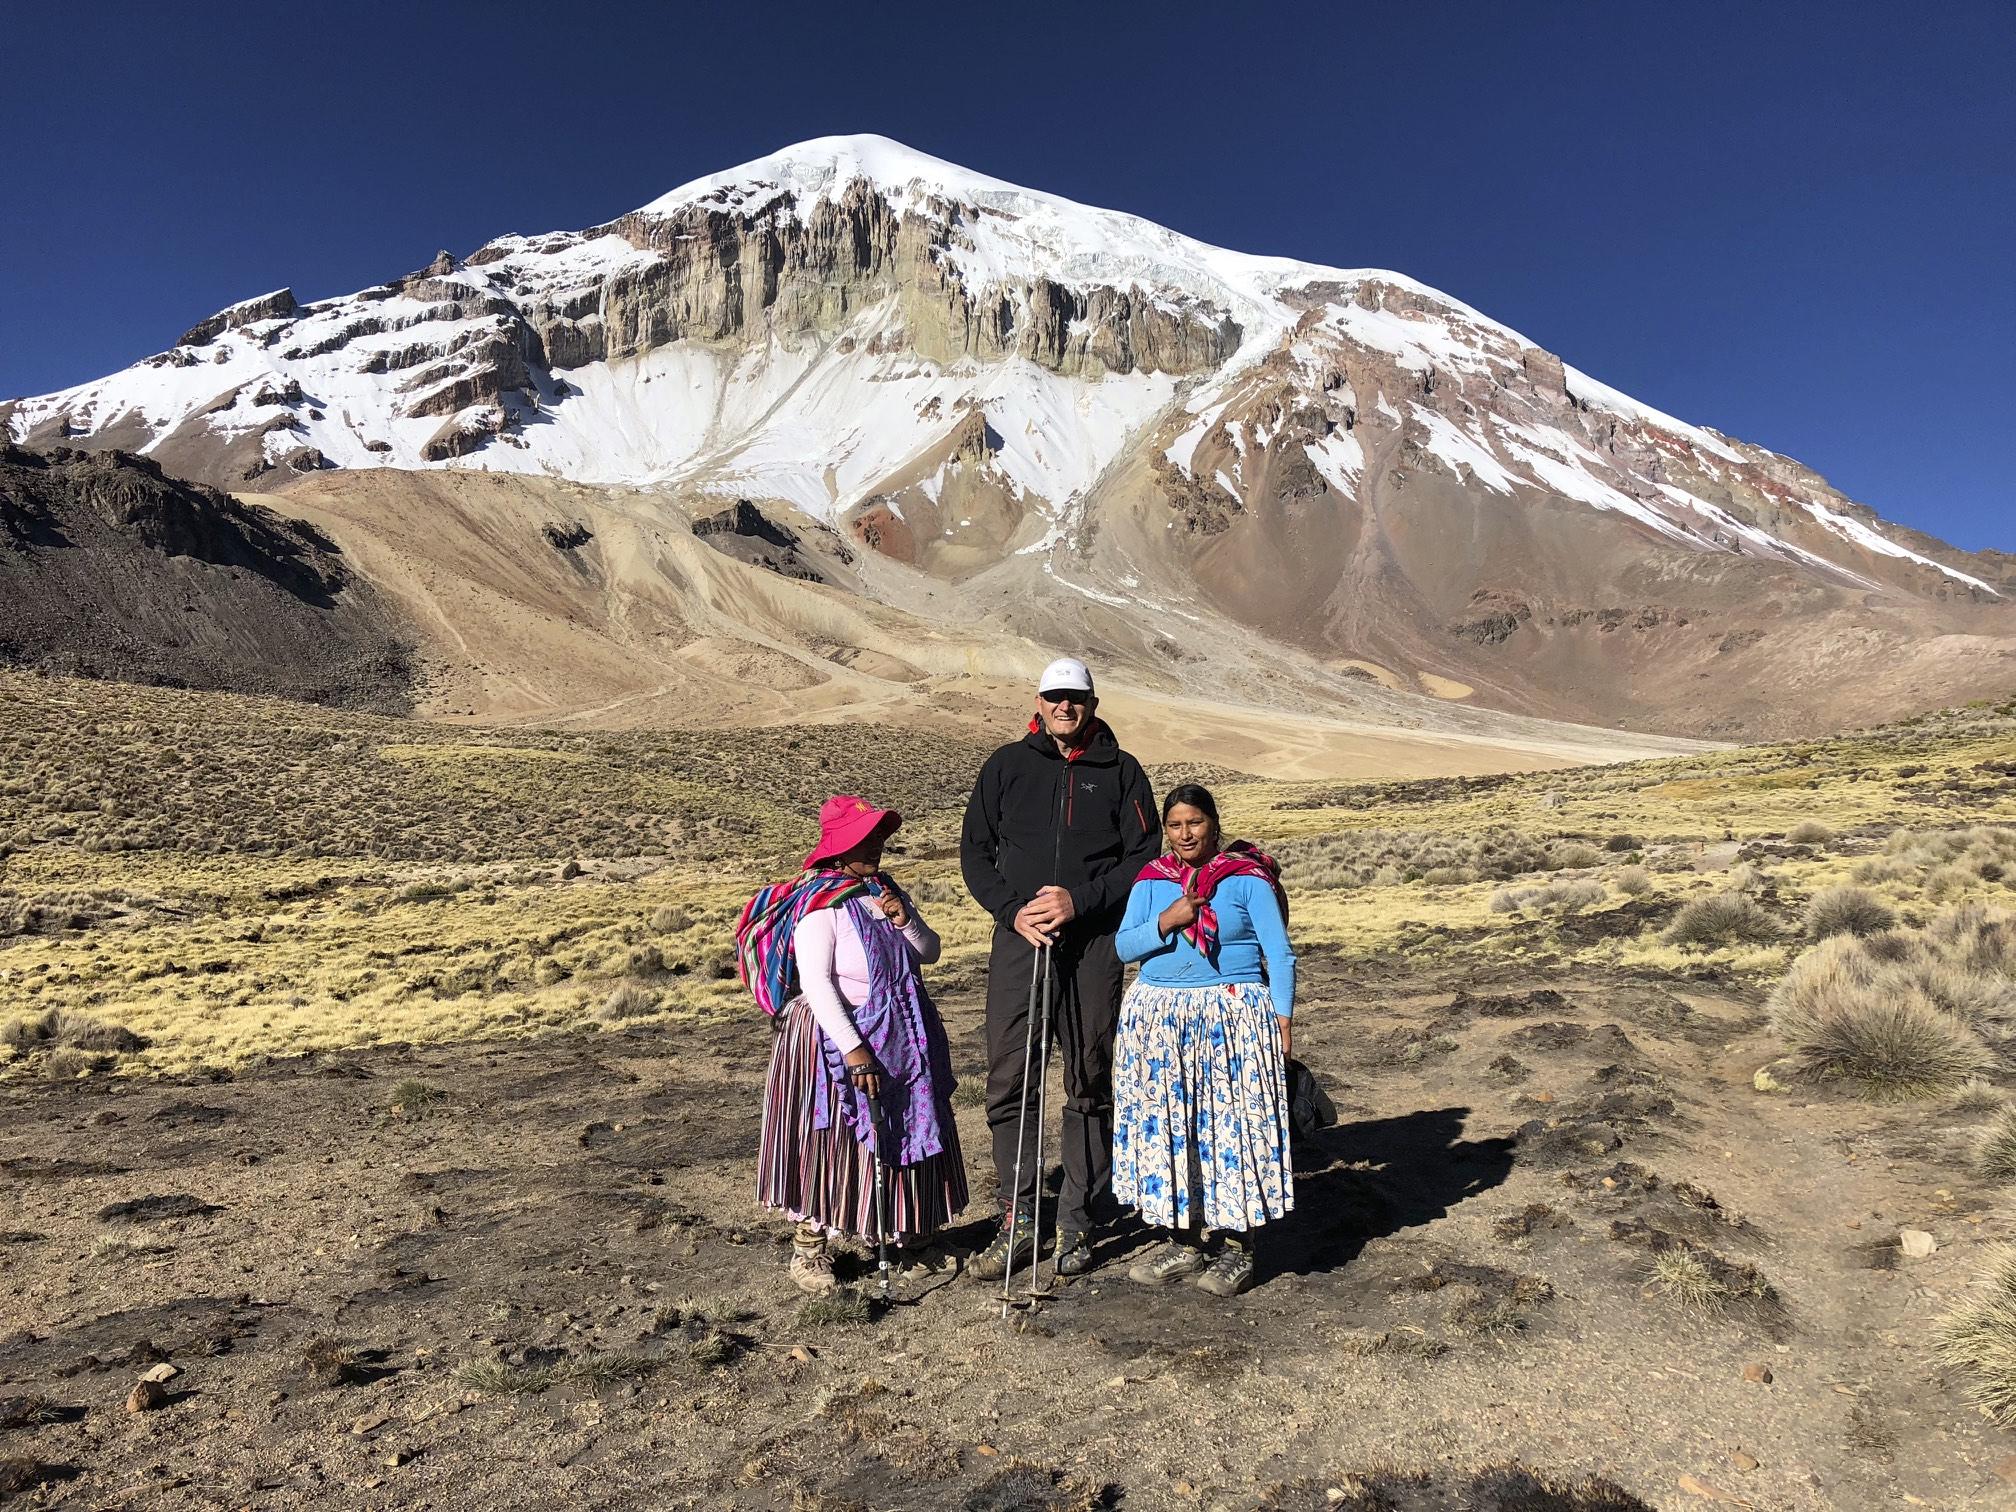 Cholitas Escaladoras - Bolivian women mountaineers